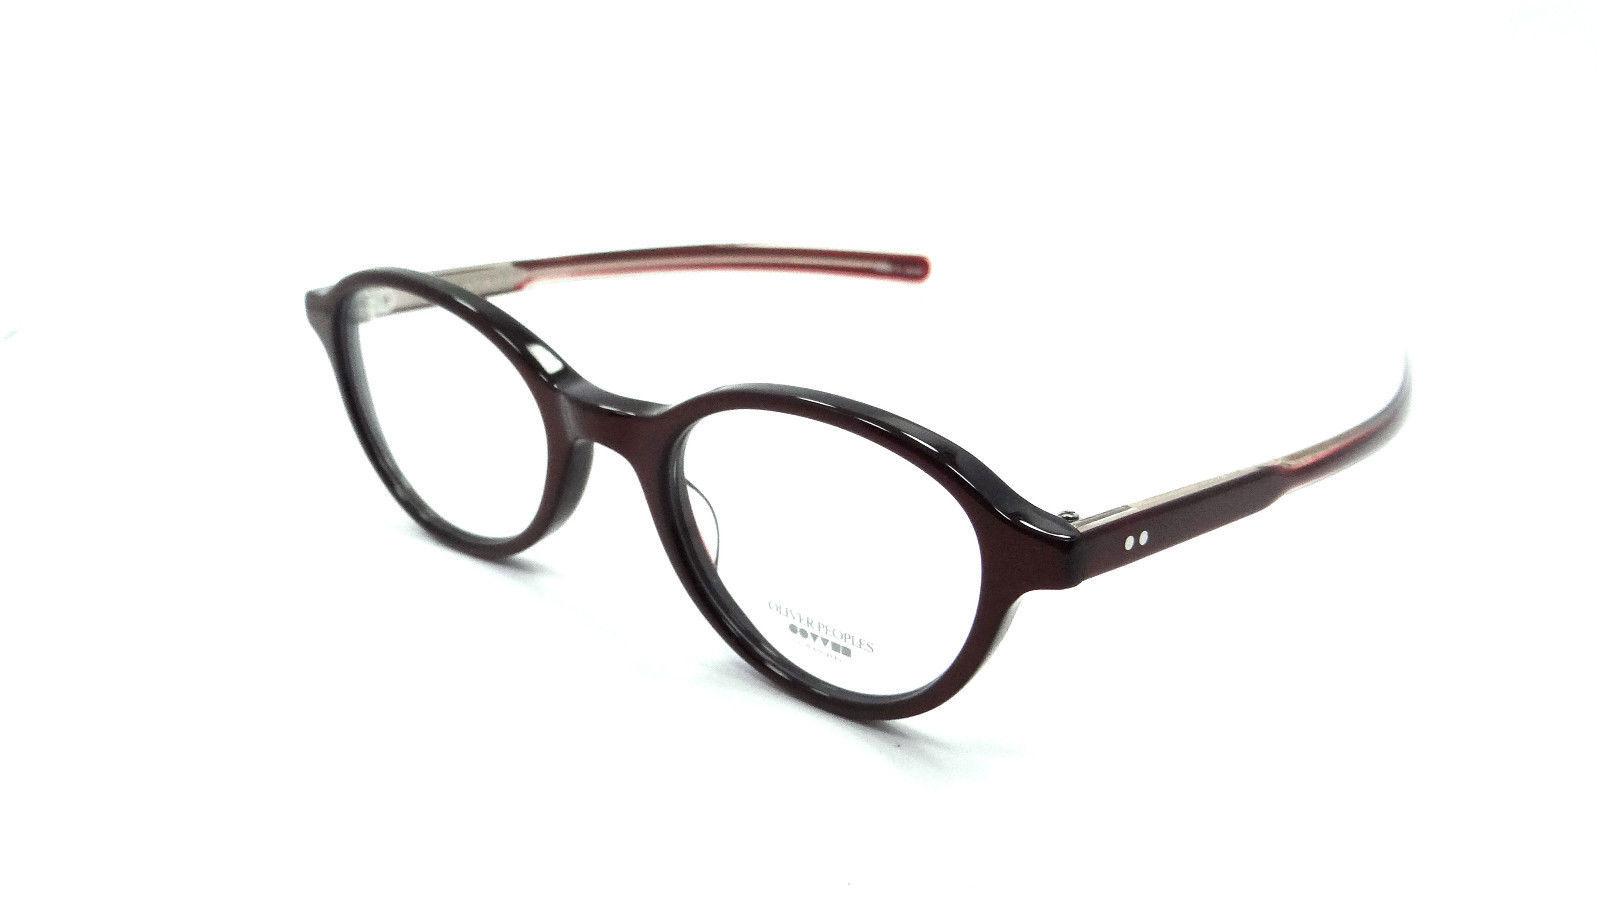 18dfedbcc12 Oliver Peoples Rx Eyeglasses Frames Rowan Roc Rose 46x21 Burgundy Made in  Japan -  70.56